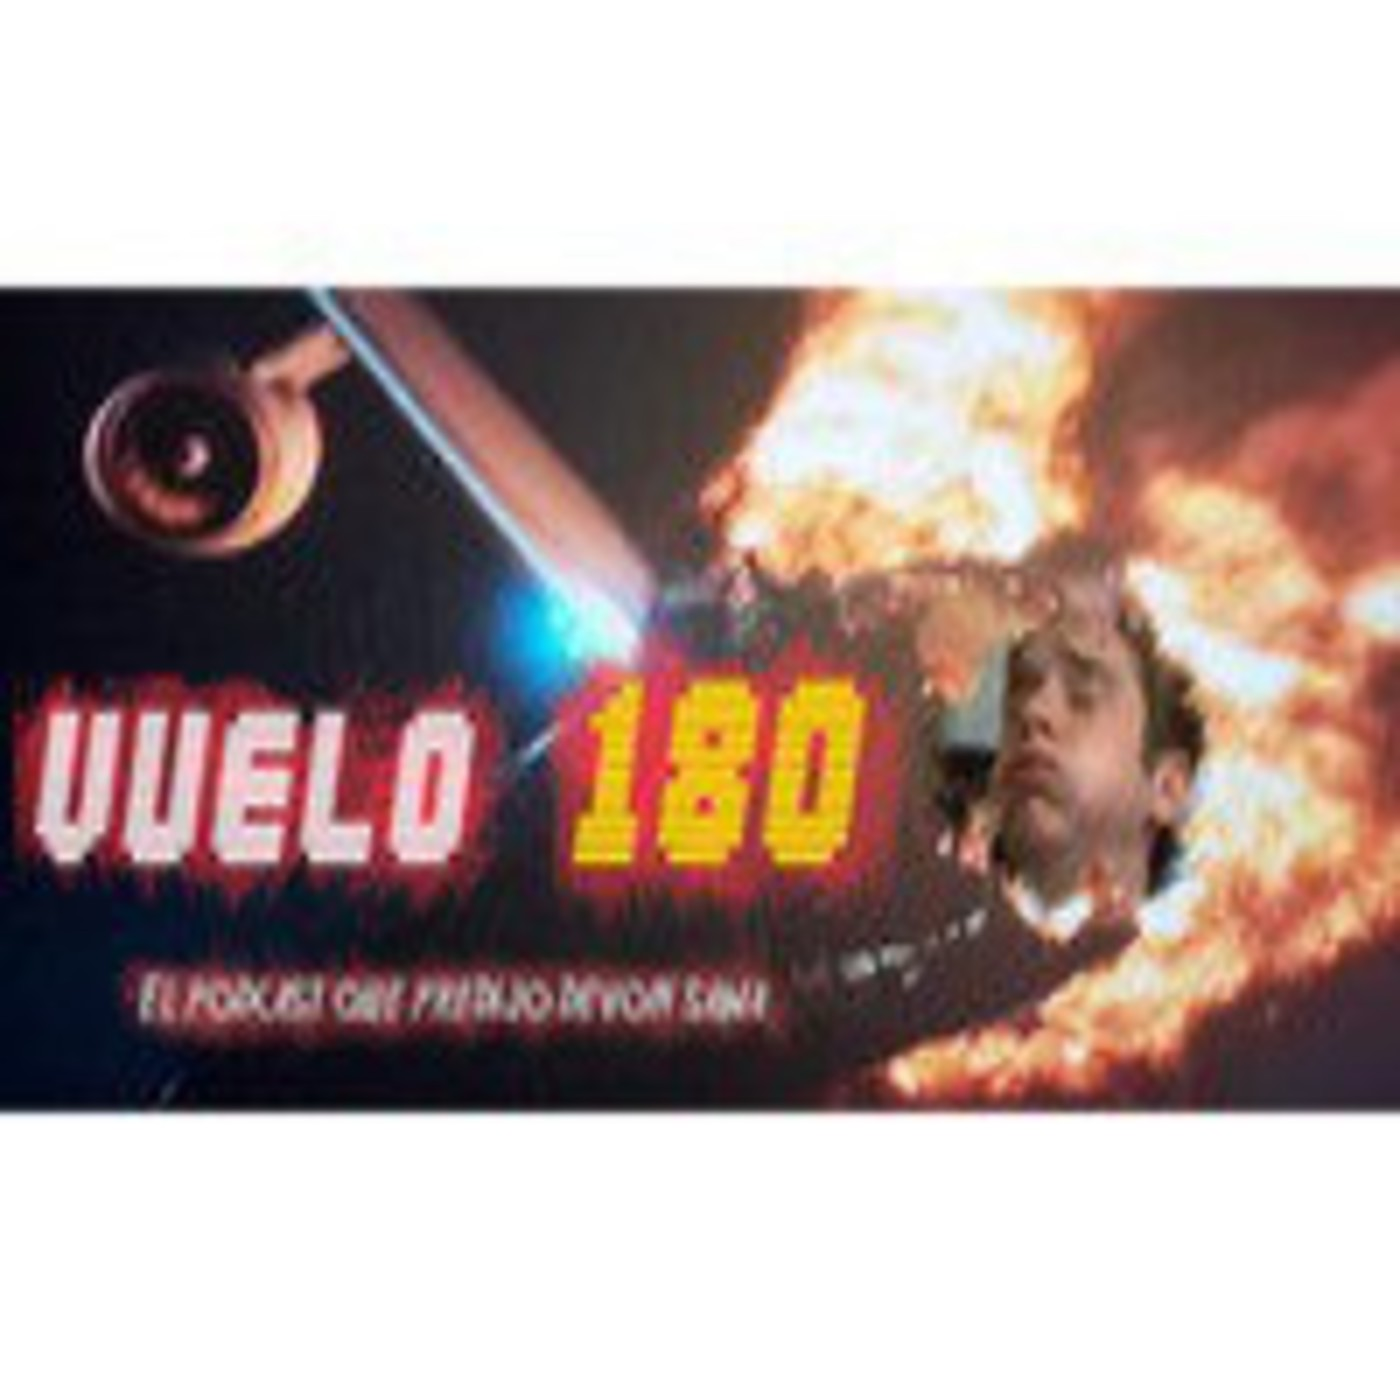 Vuelo 180 3B- Imanes Bowie